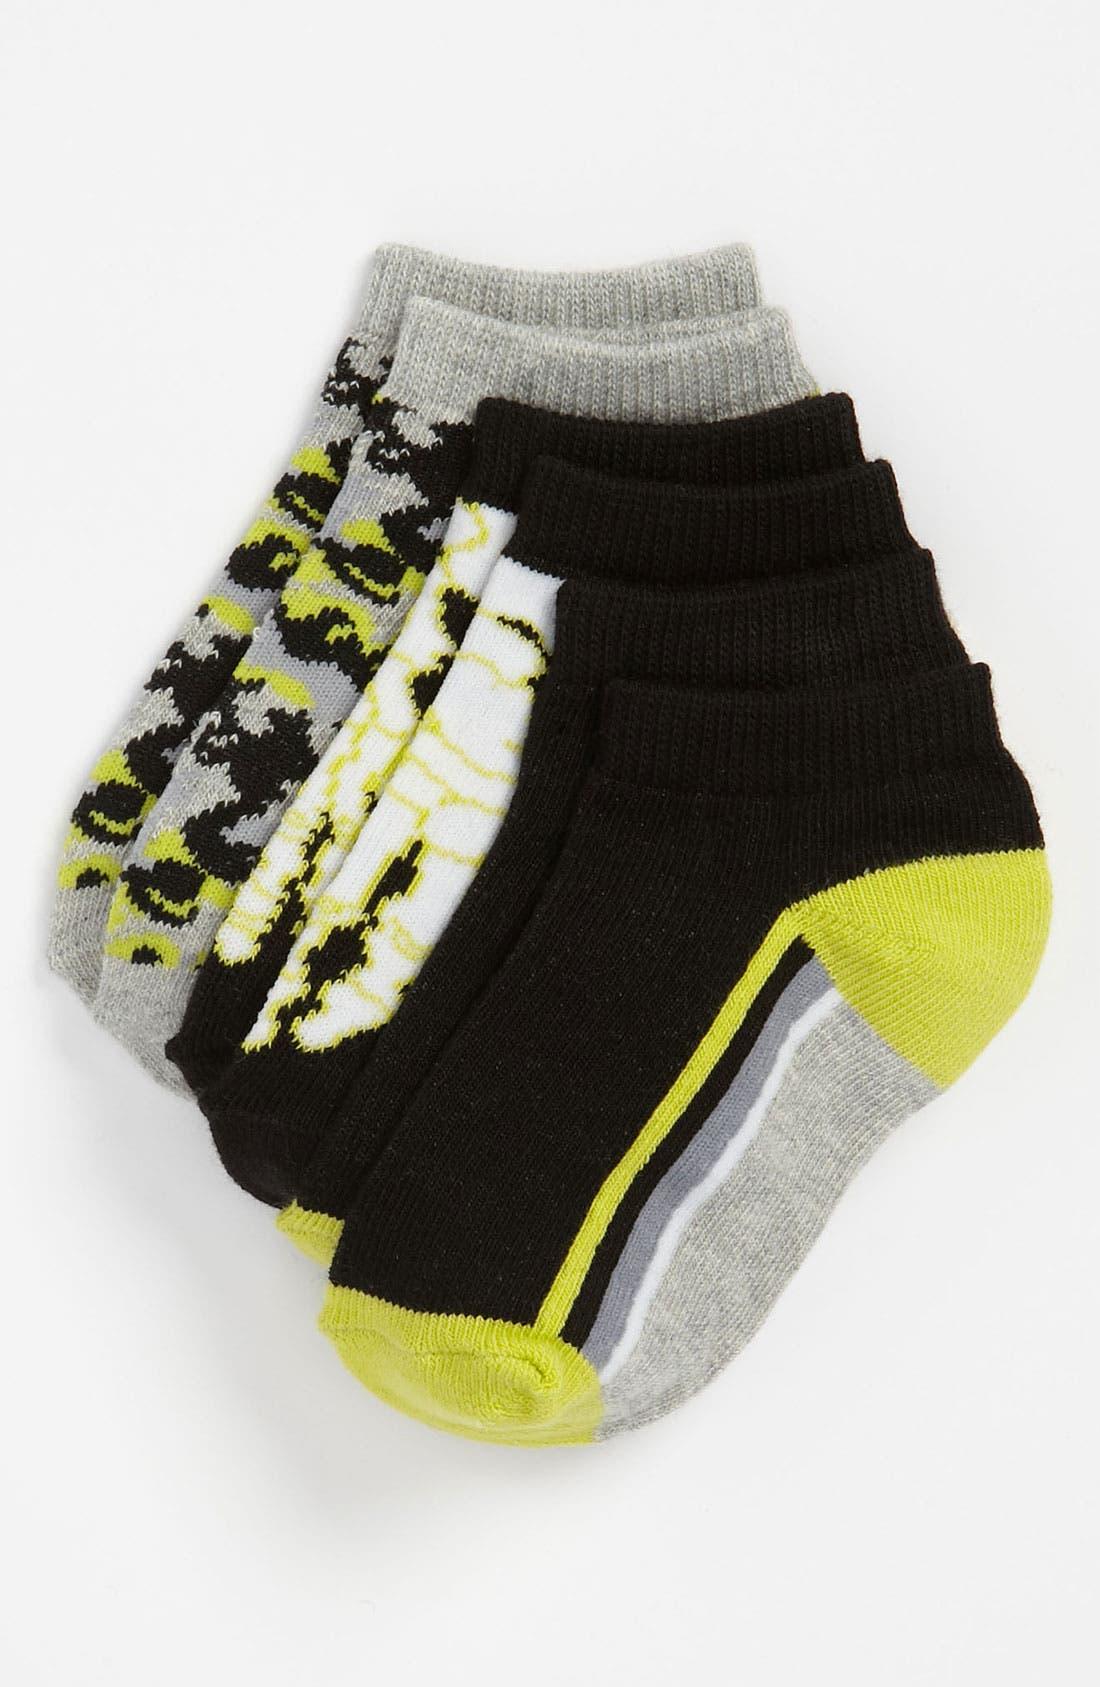 Alternate Image 1 Selected - Nordstrom 'Crossbones' Socks (3-Pack) (Toddler, Little Boys & Big Boys)